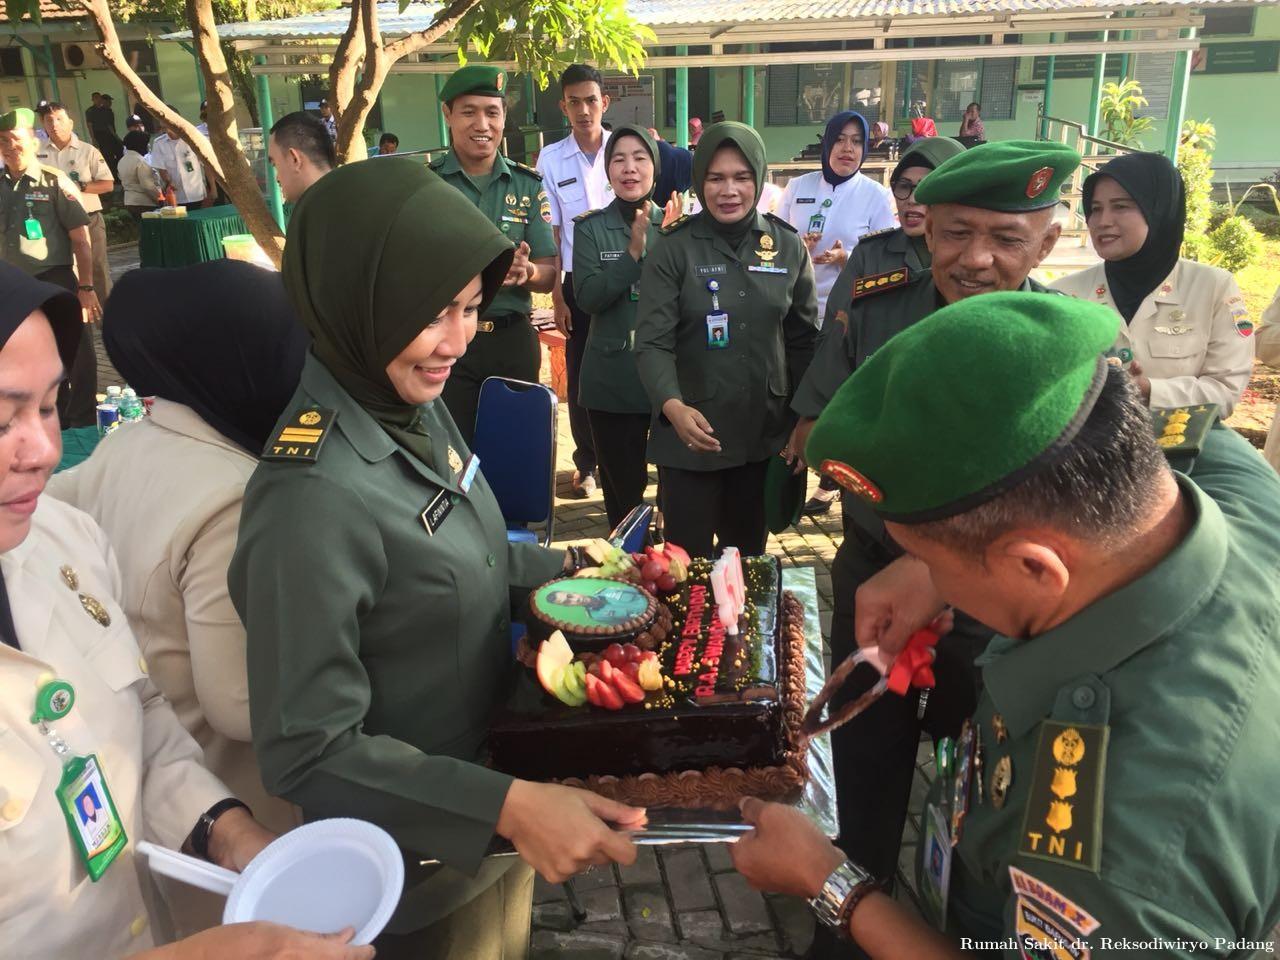 Perayaan Ulang Tahun Kepala Rumah Sakit dr. Reksodiwiryo Padang